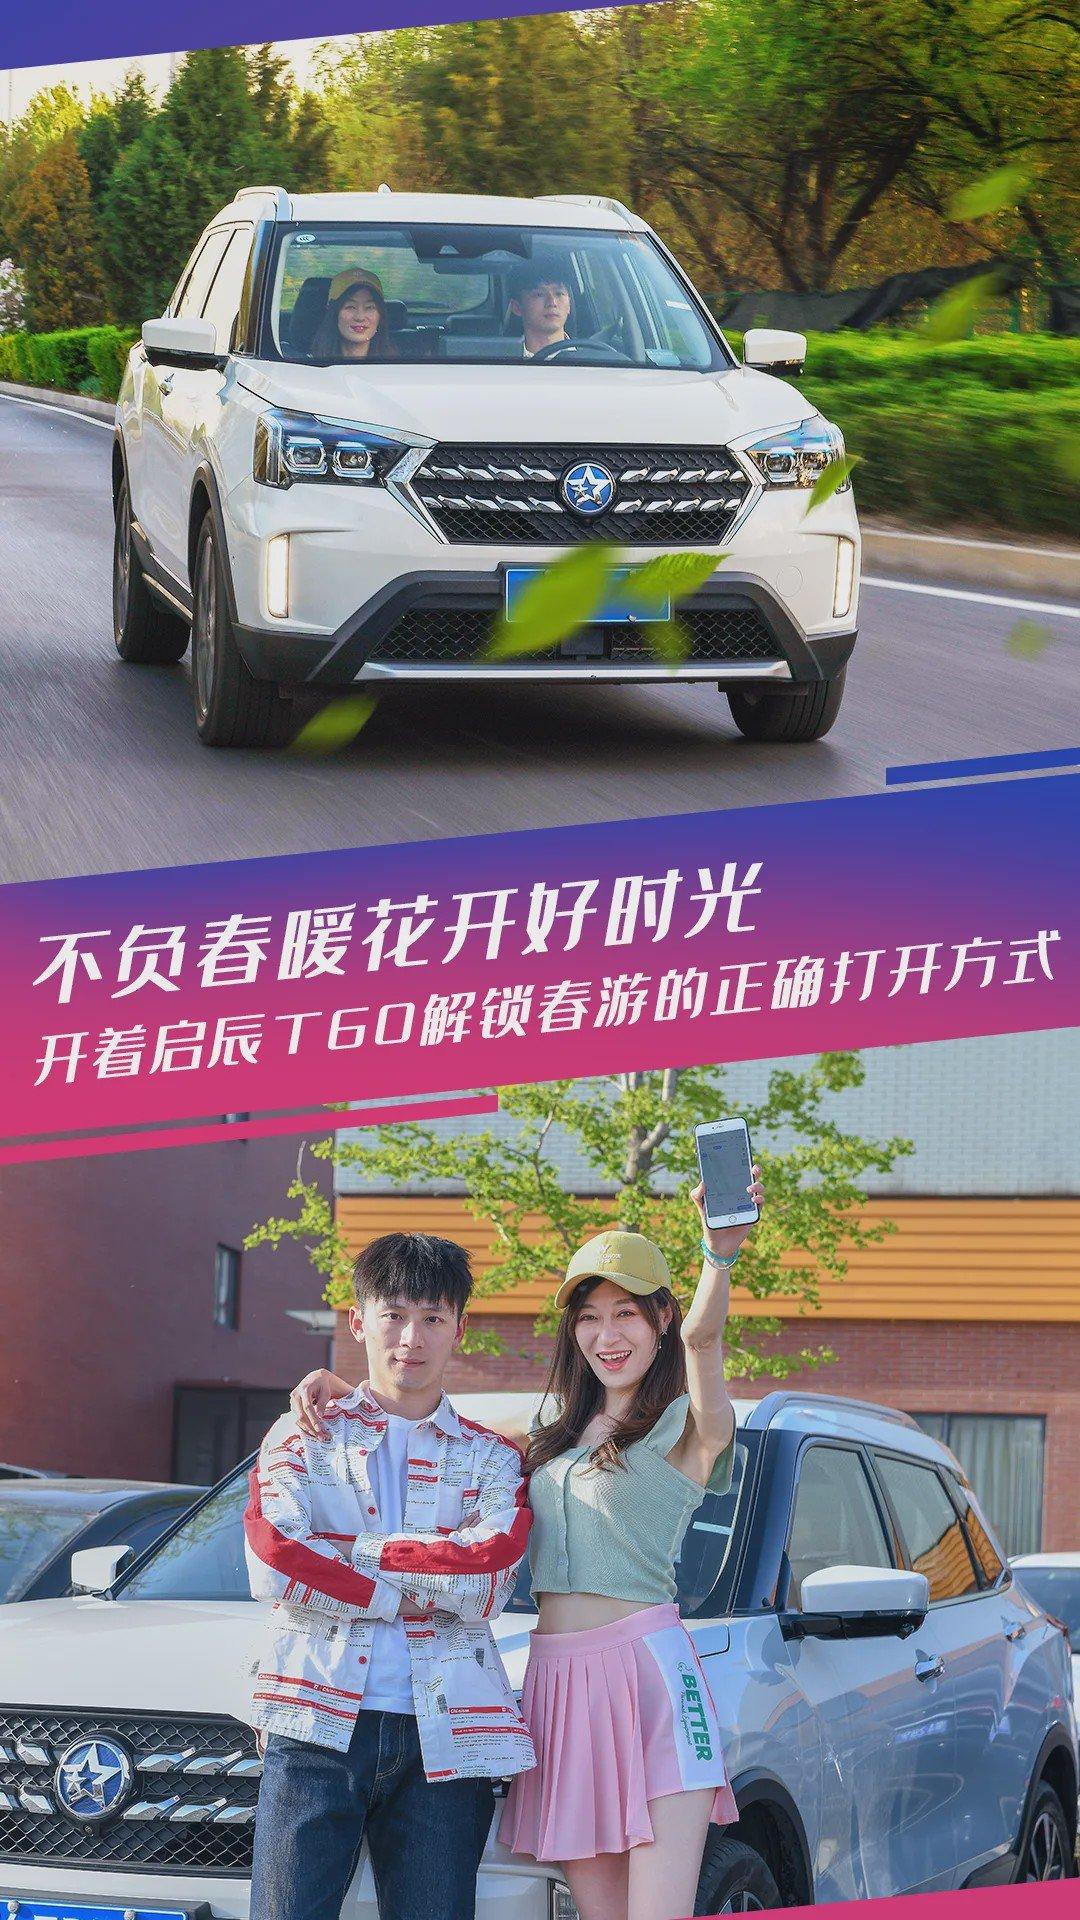 http://www.weixinrensheng.com/qichekong/1997387.html